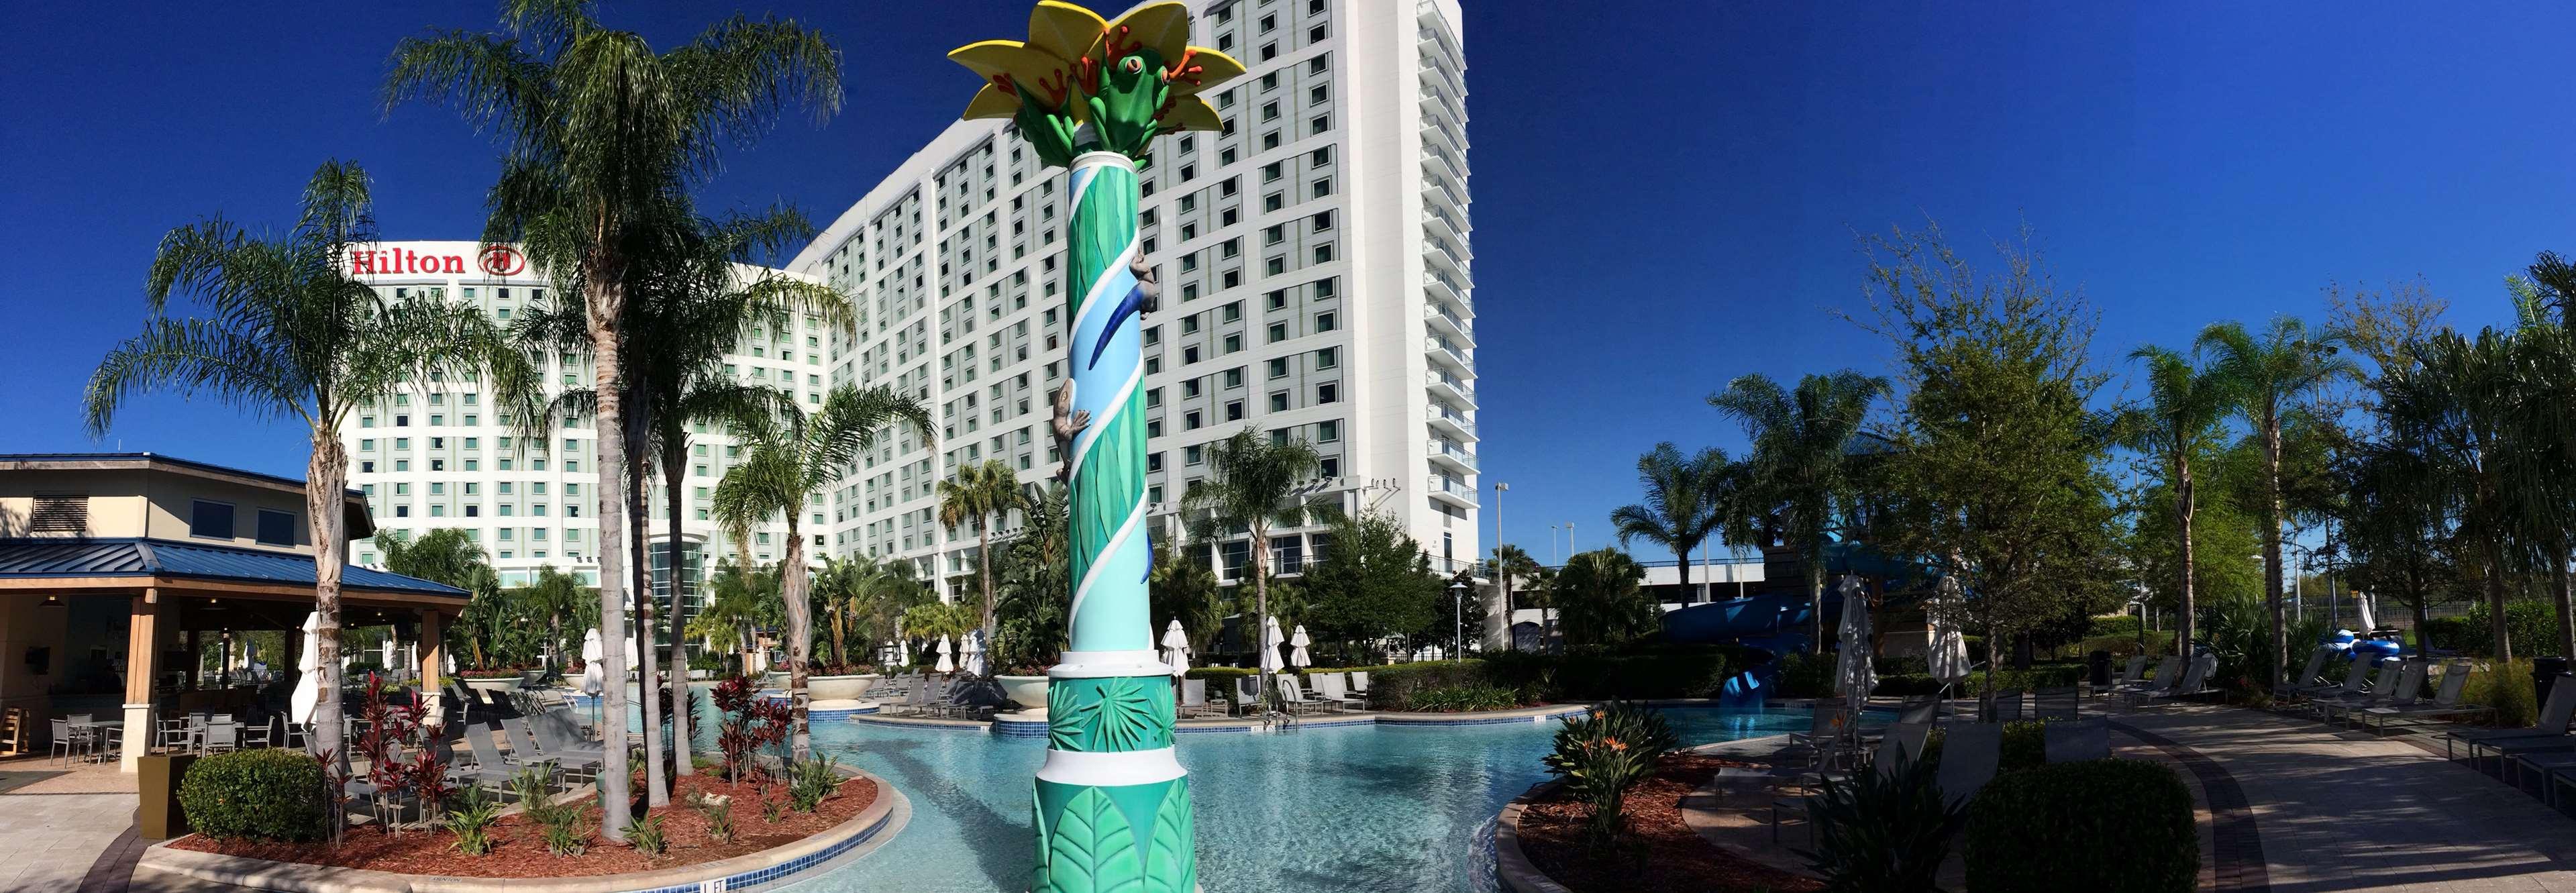 Hilton Orlando image 15